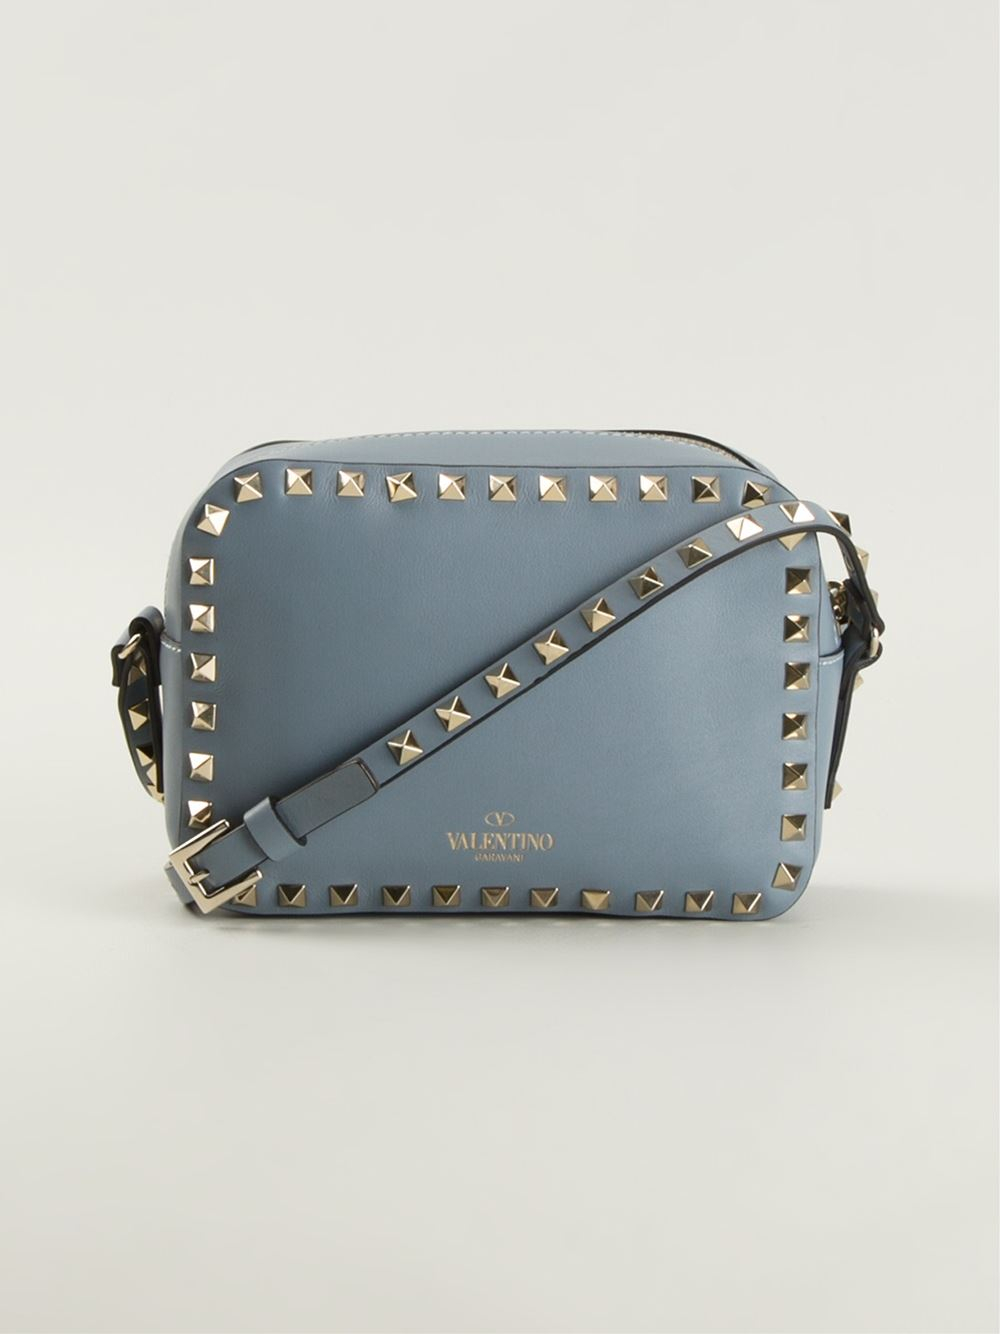 9b2ade5c6 Valentino Rockstud Cross Body Bag in Blue - Lyst